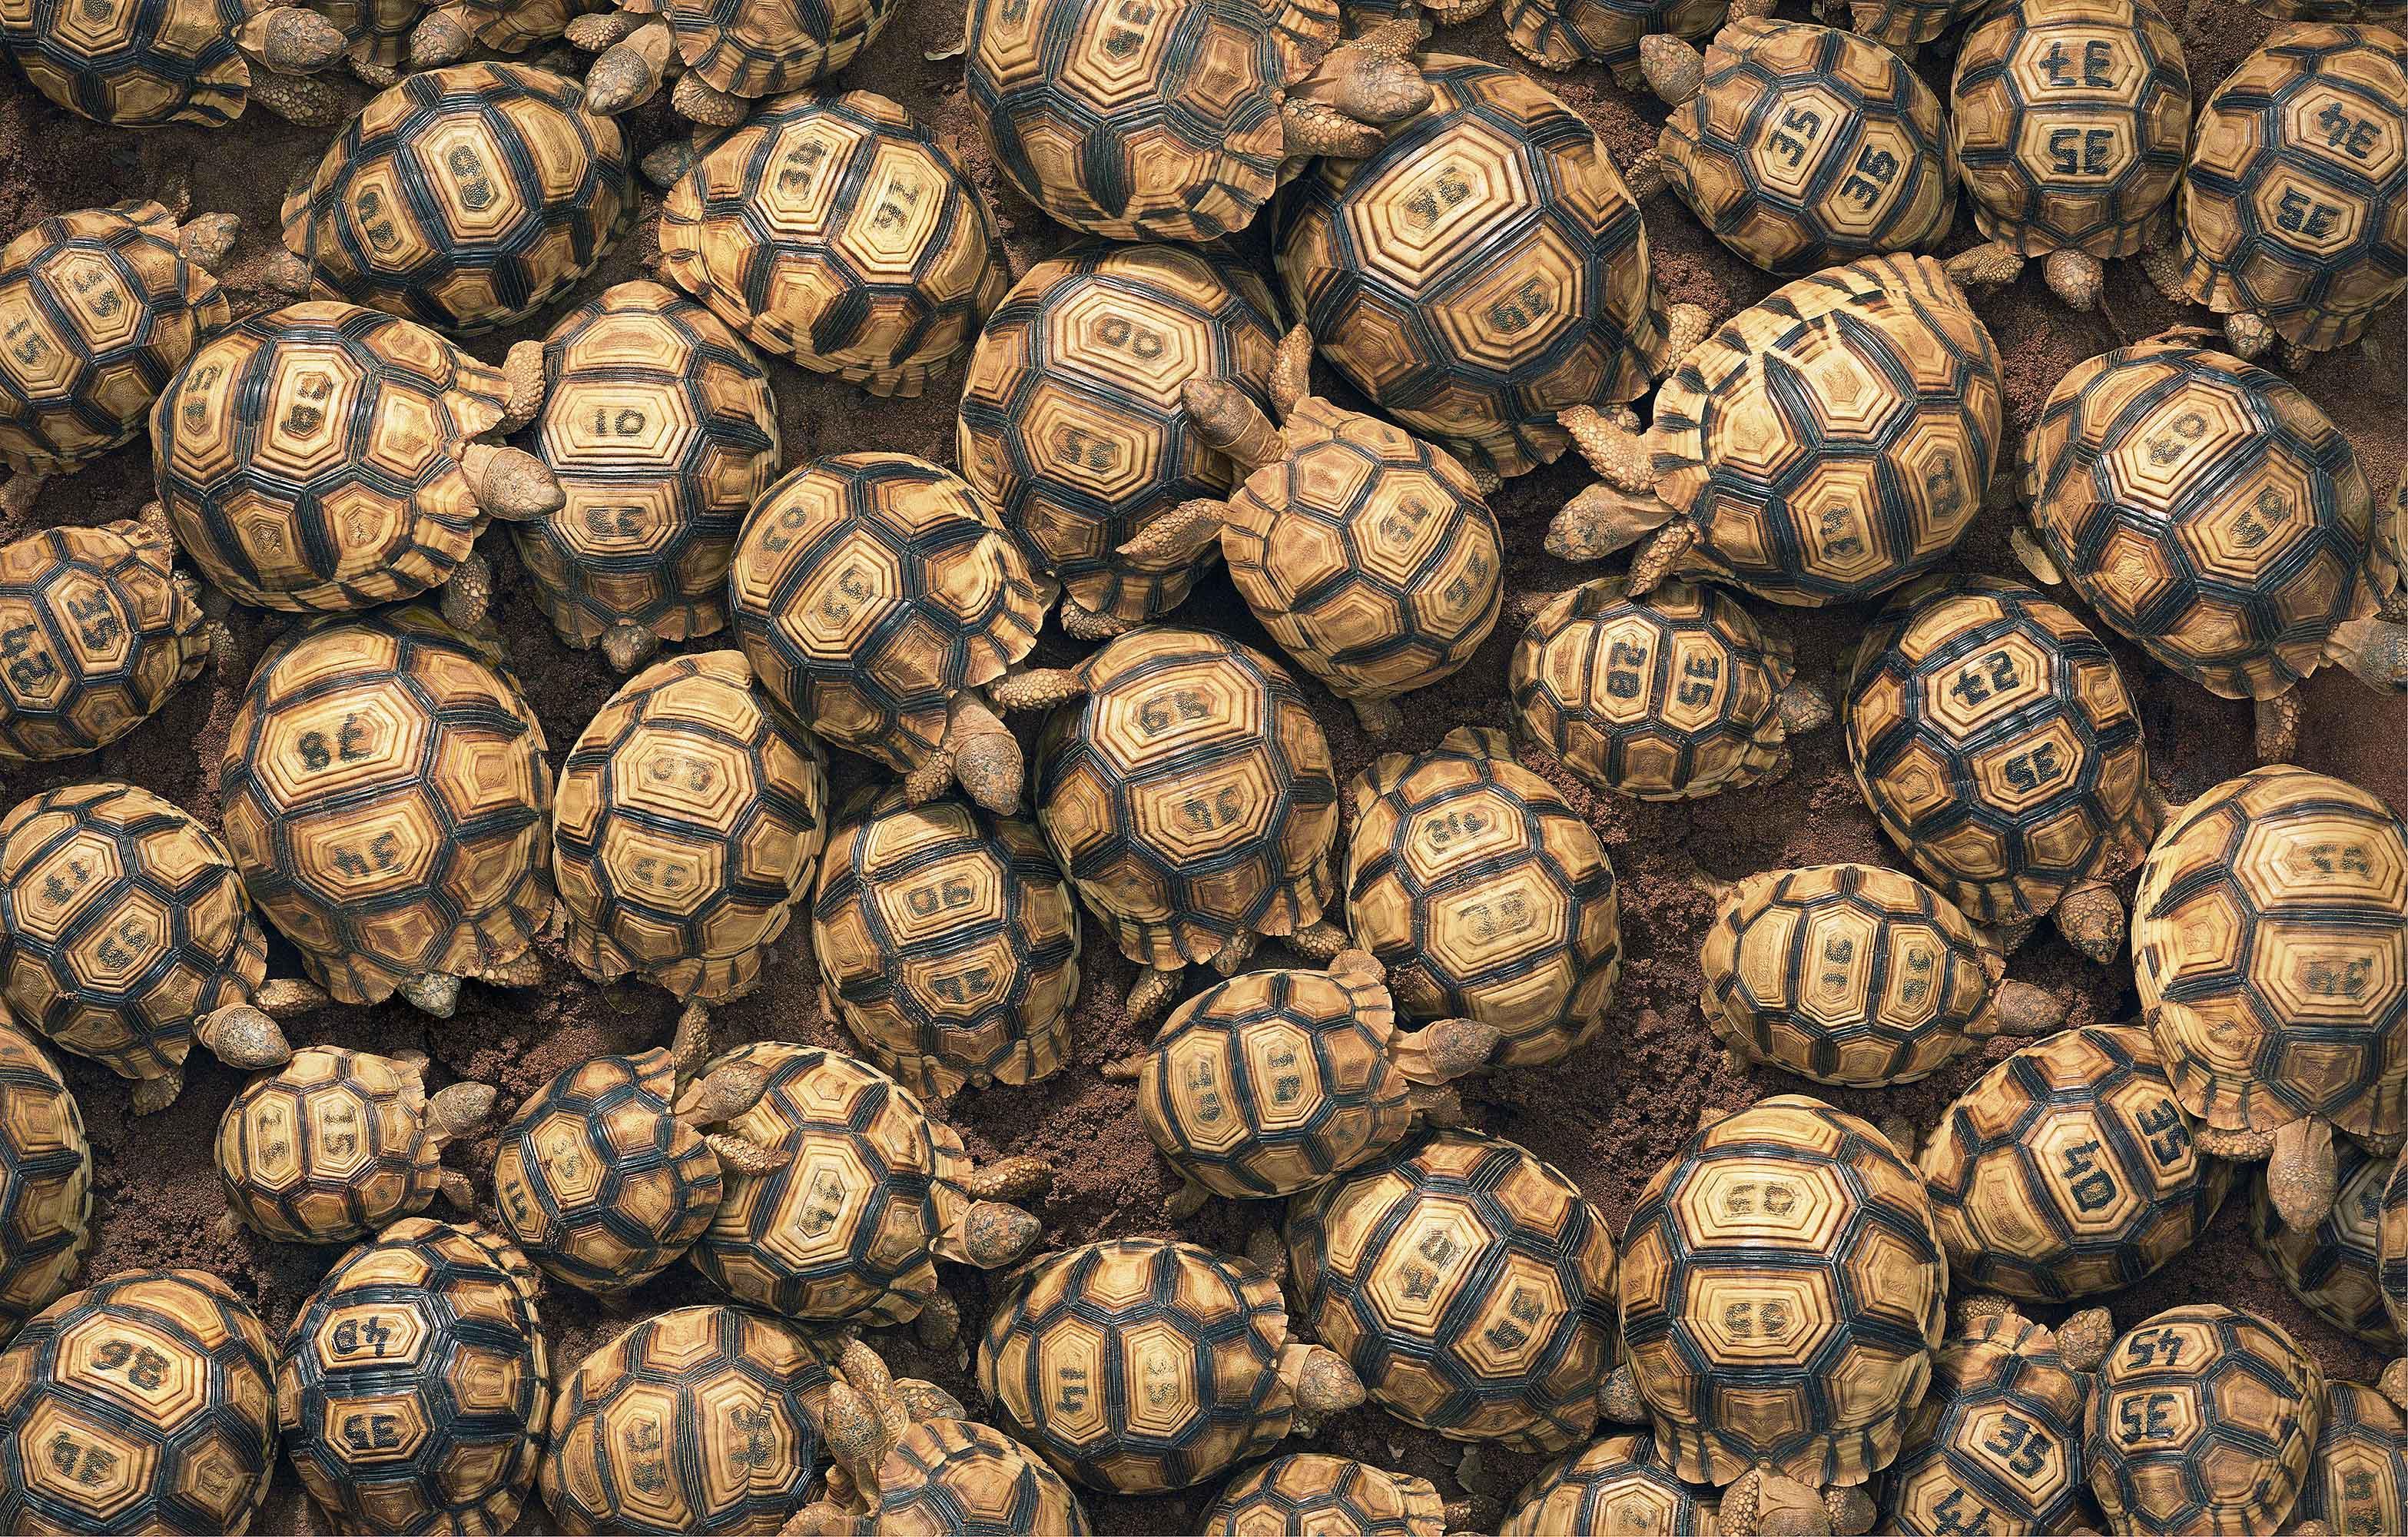 Tim_Flach_Ploughshare Tortoises.jpg